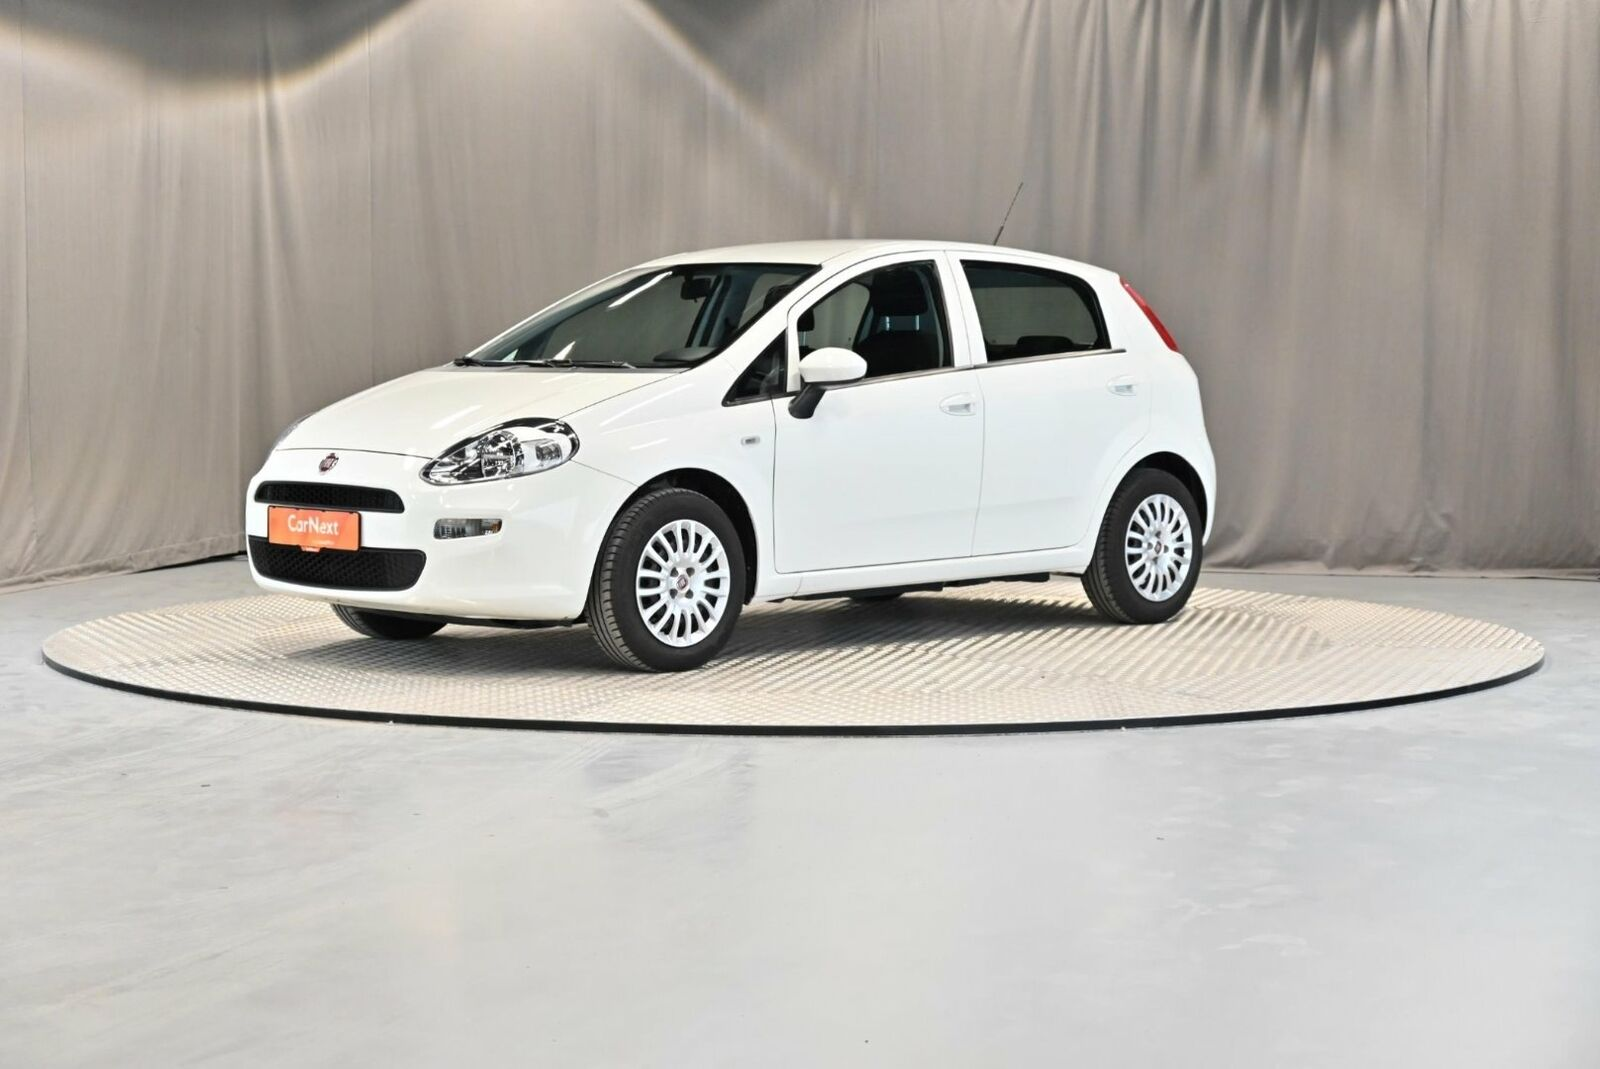 Fiat Punto 1,2 Pop 5d - 69.900 kr.